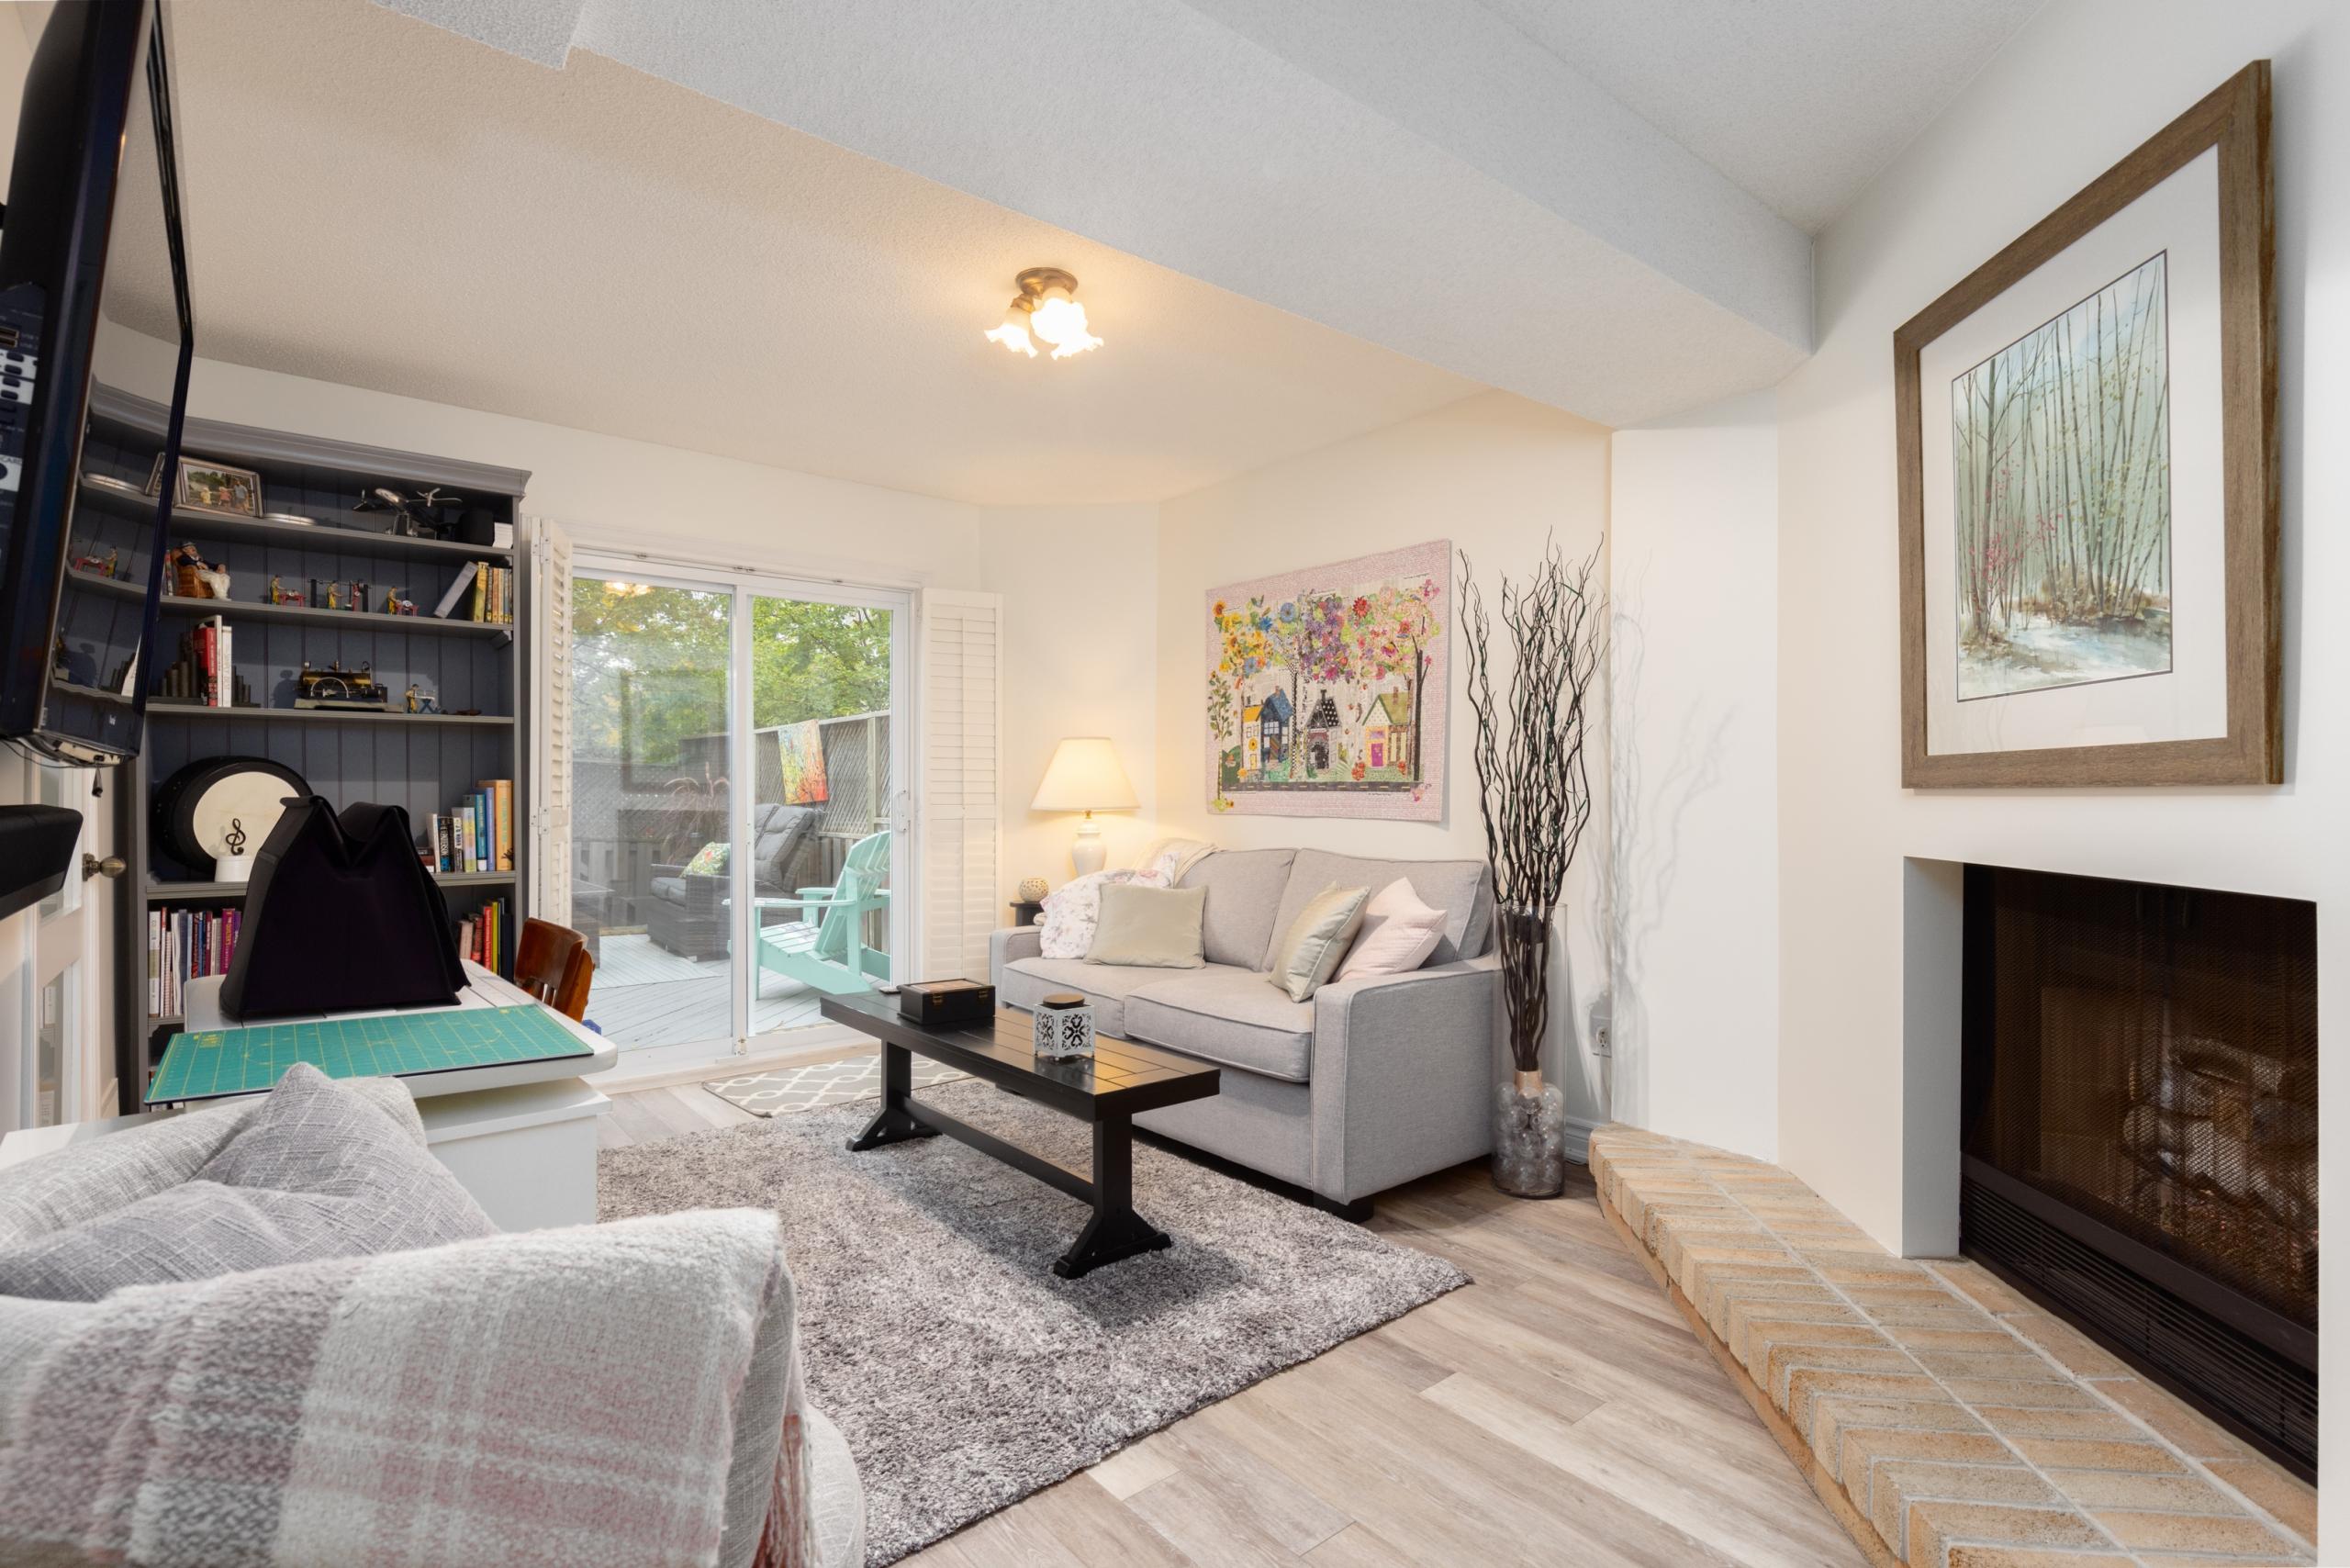 Living room featured at 16-2299 Marine Drive, Oakville, ON at Alex Irish & Associates